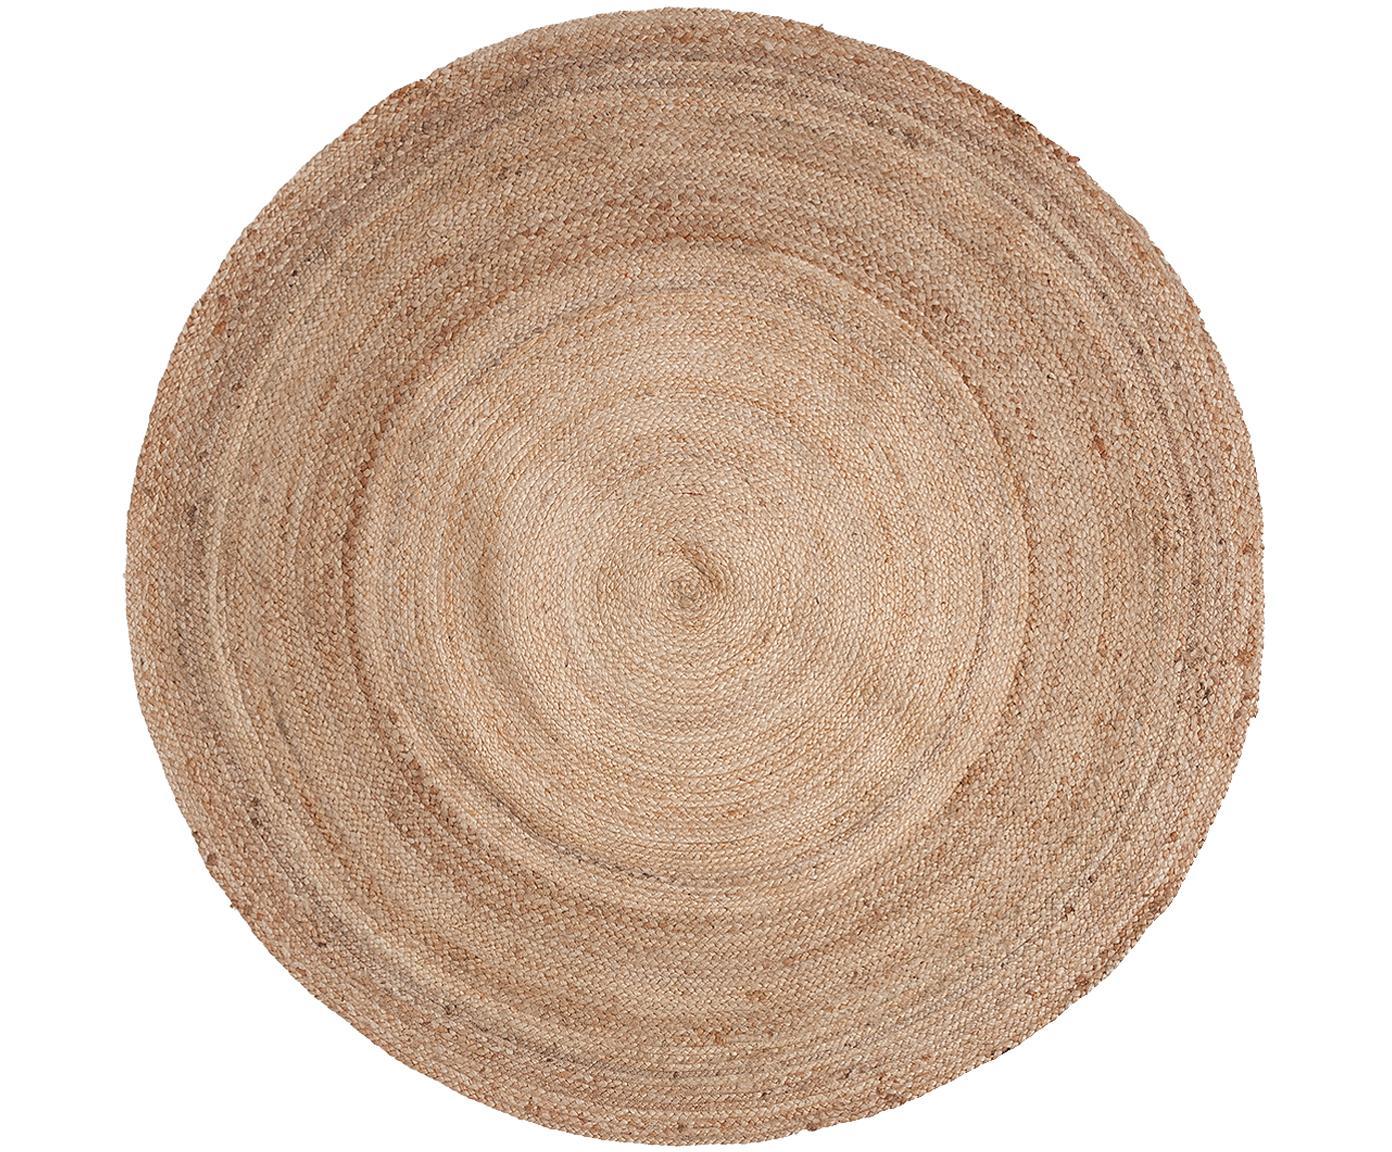 Alfombra redonda de yute Ural, Yute, Beige, Ø 150 cm (Tamaño M)